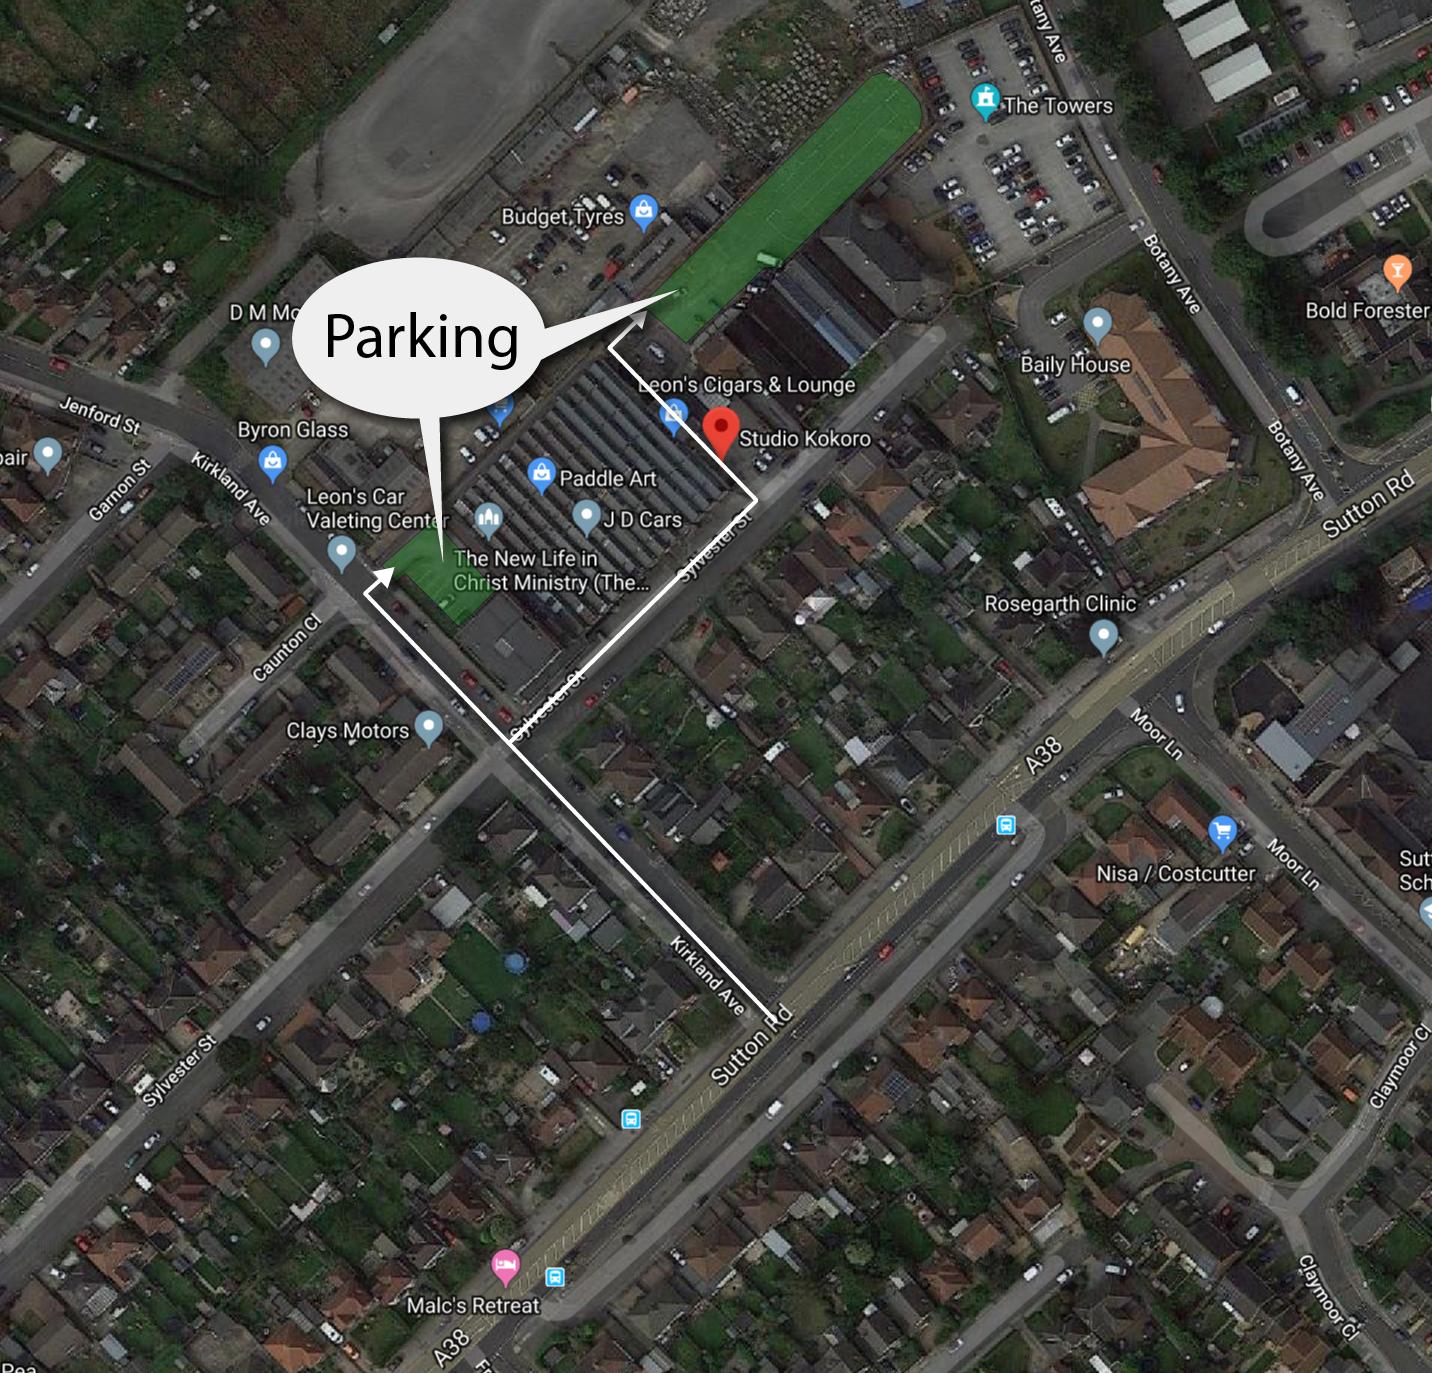 Studio Kokoro parking map